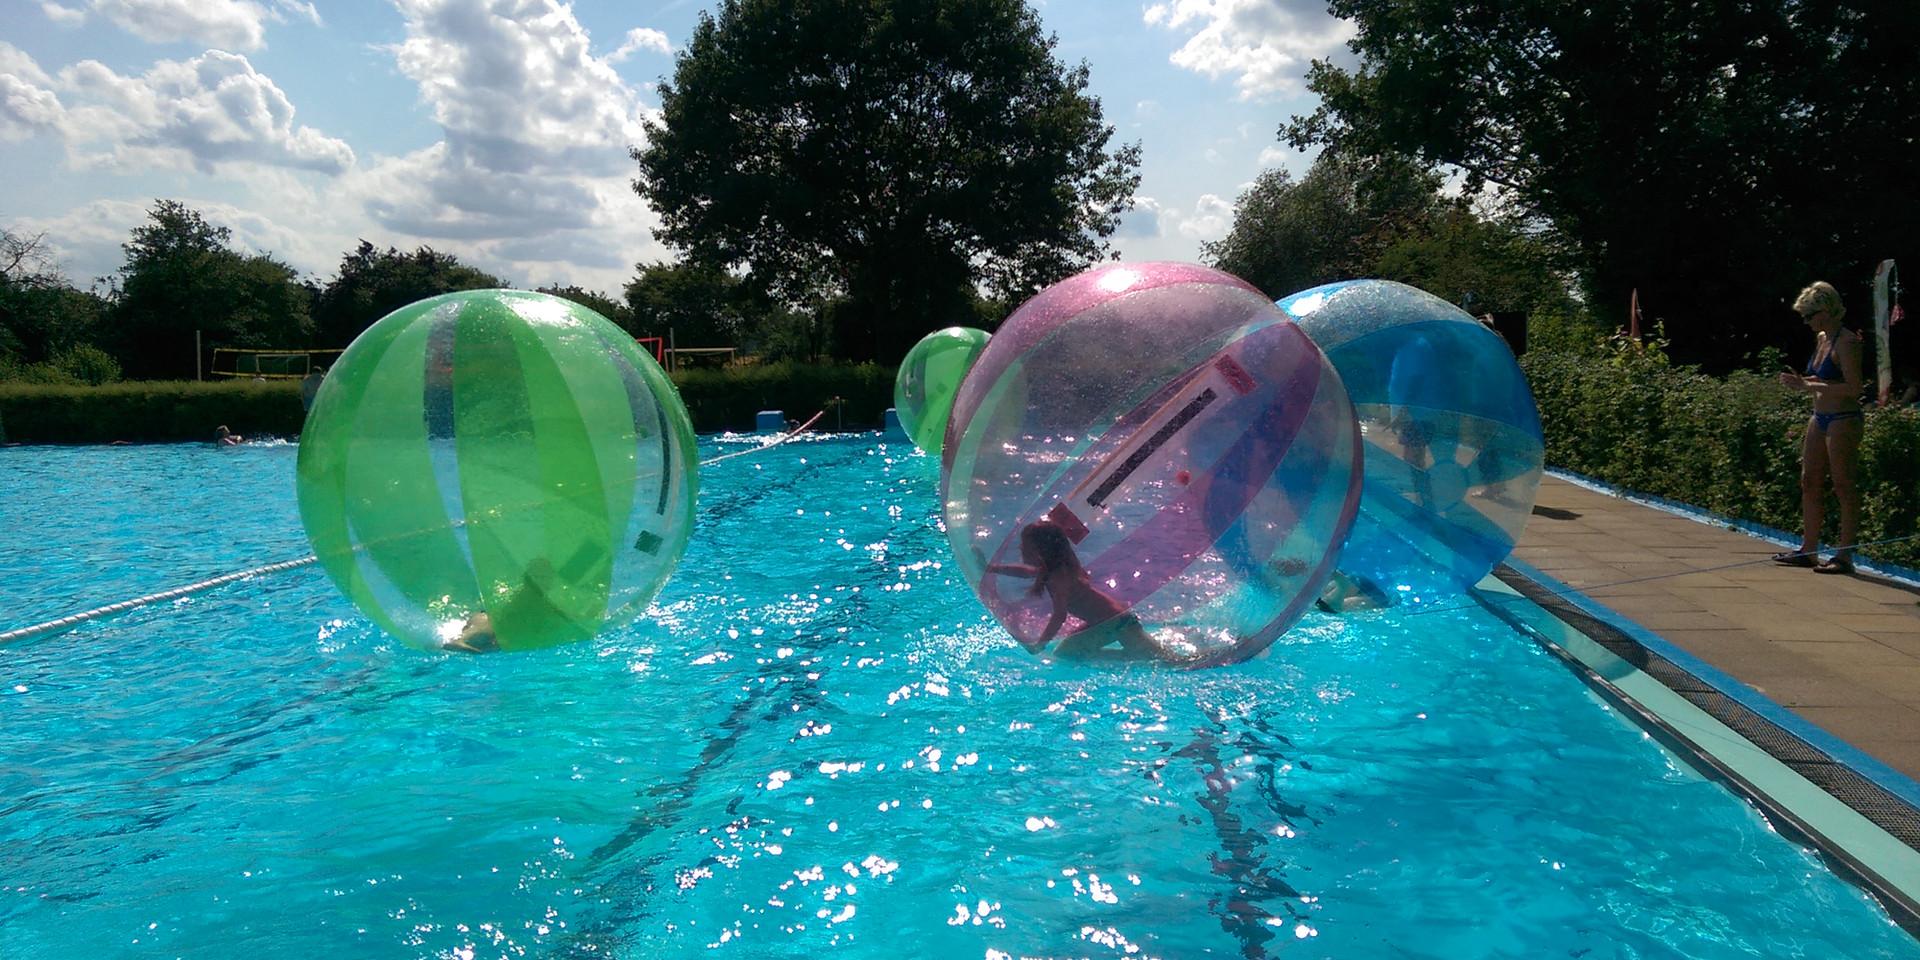 Wasserball Freibad.jpg